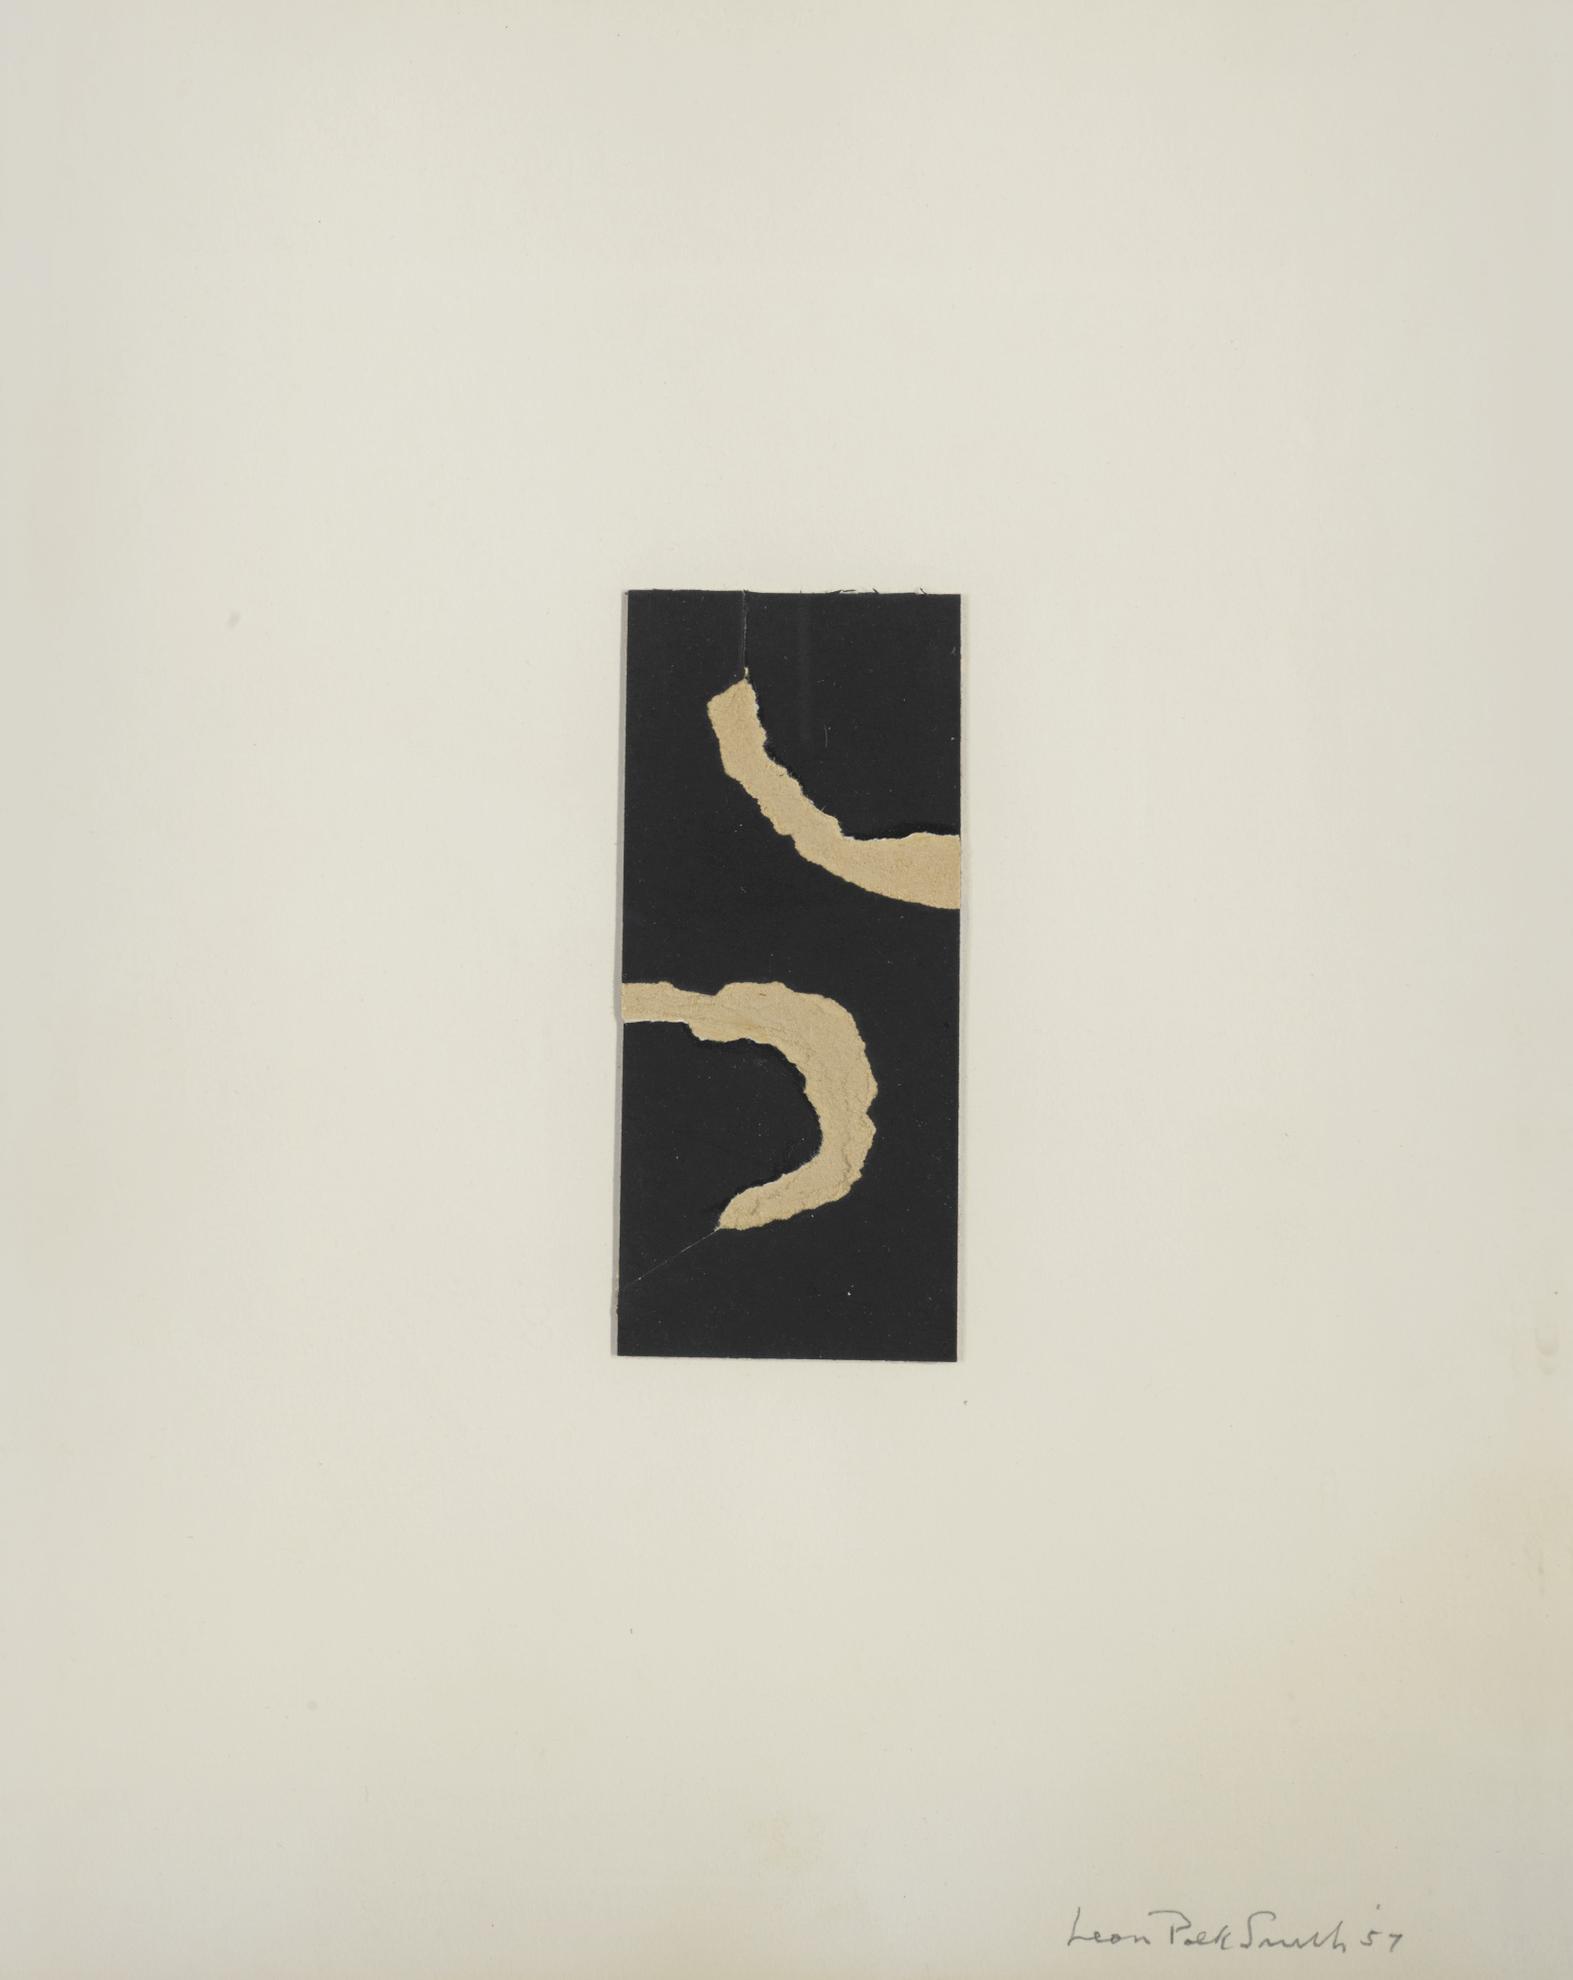 Leon Polk Smith-Untitled-1957